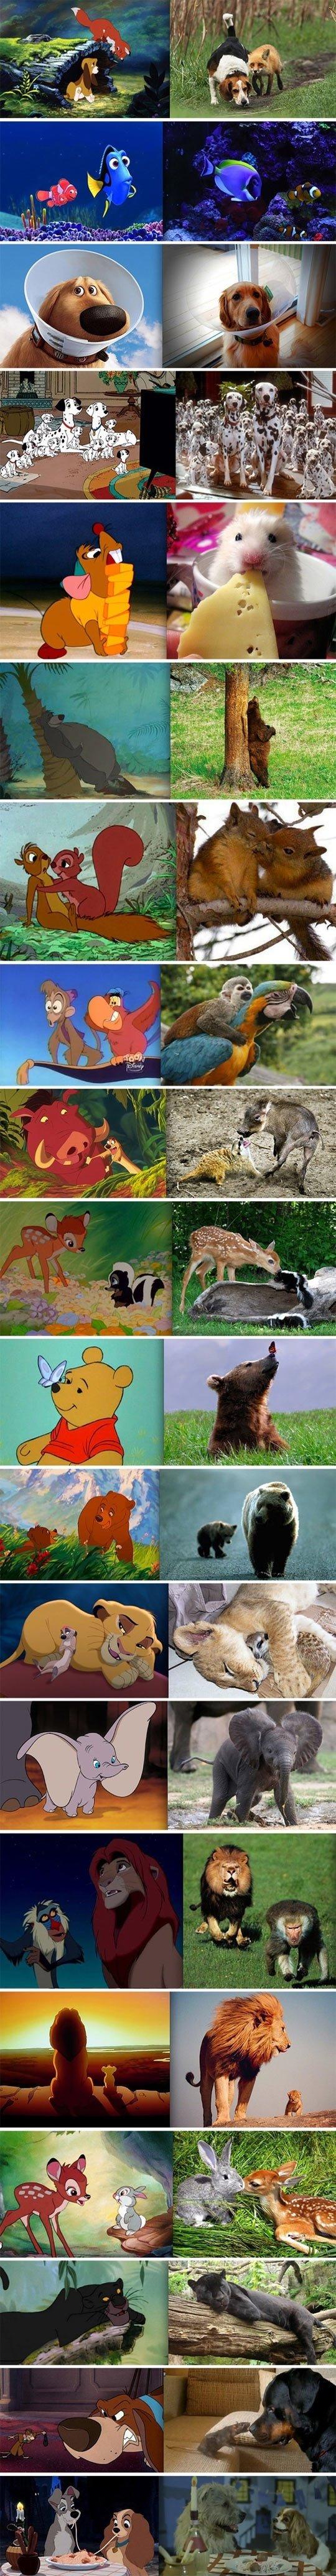 Disney animals in real life. .. why is Simba chasing Rafiki???